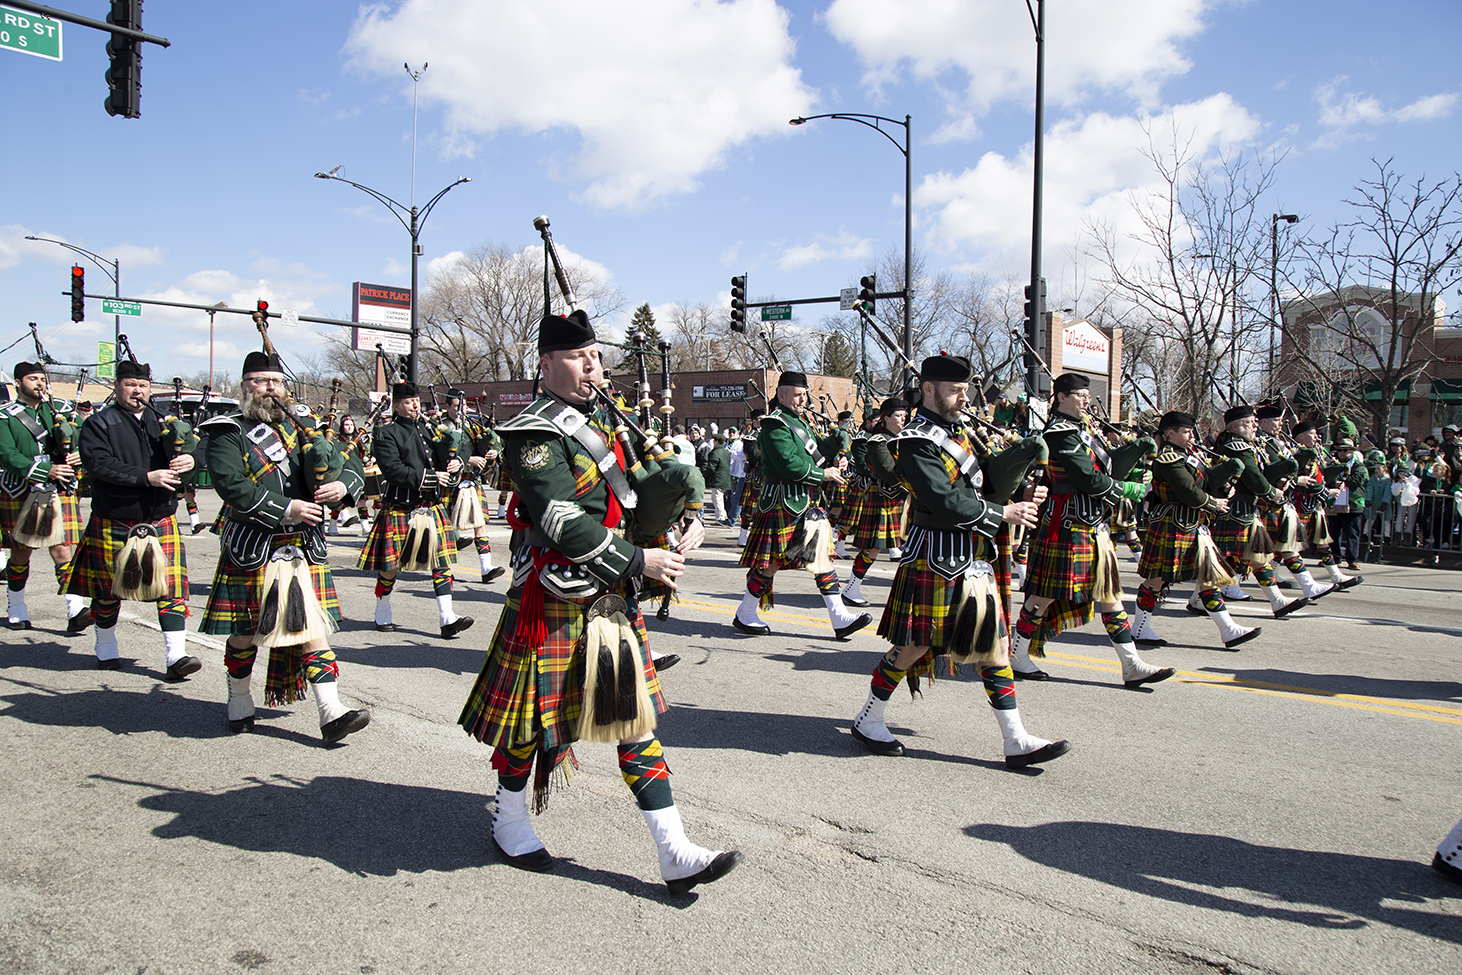 Chicago+Stockyard+kilty+Band+at+the+Southside+Irish+St.+Patrick%27s+Day+Parade+Mar.+18.